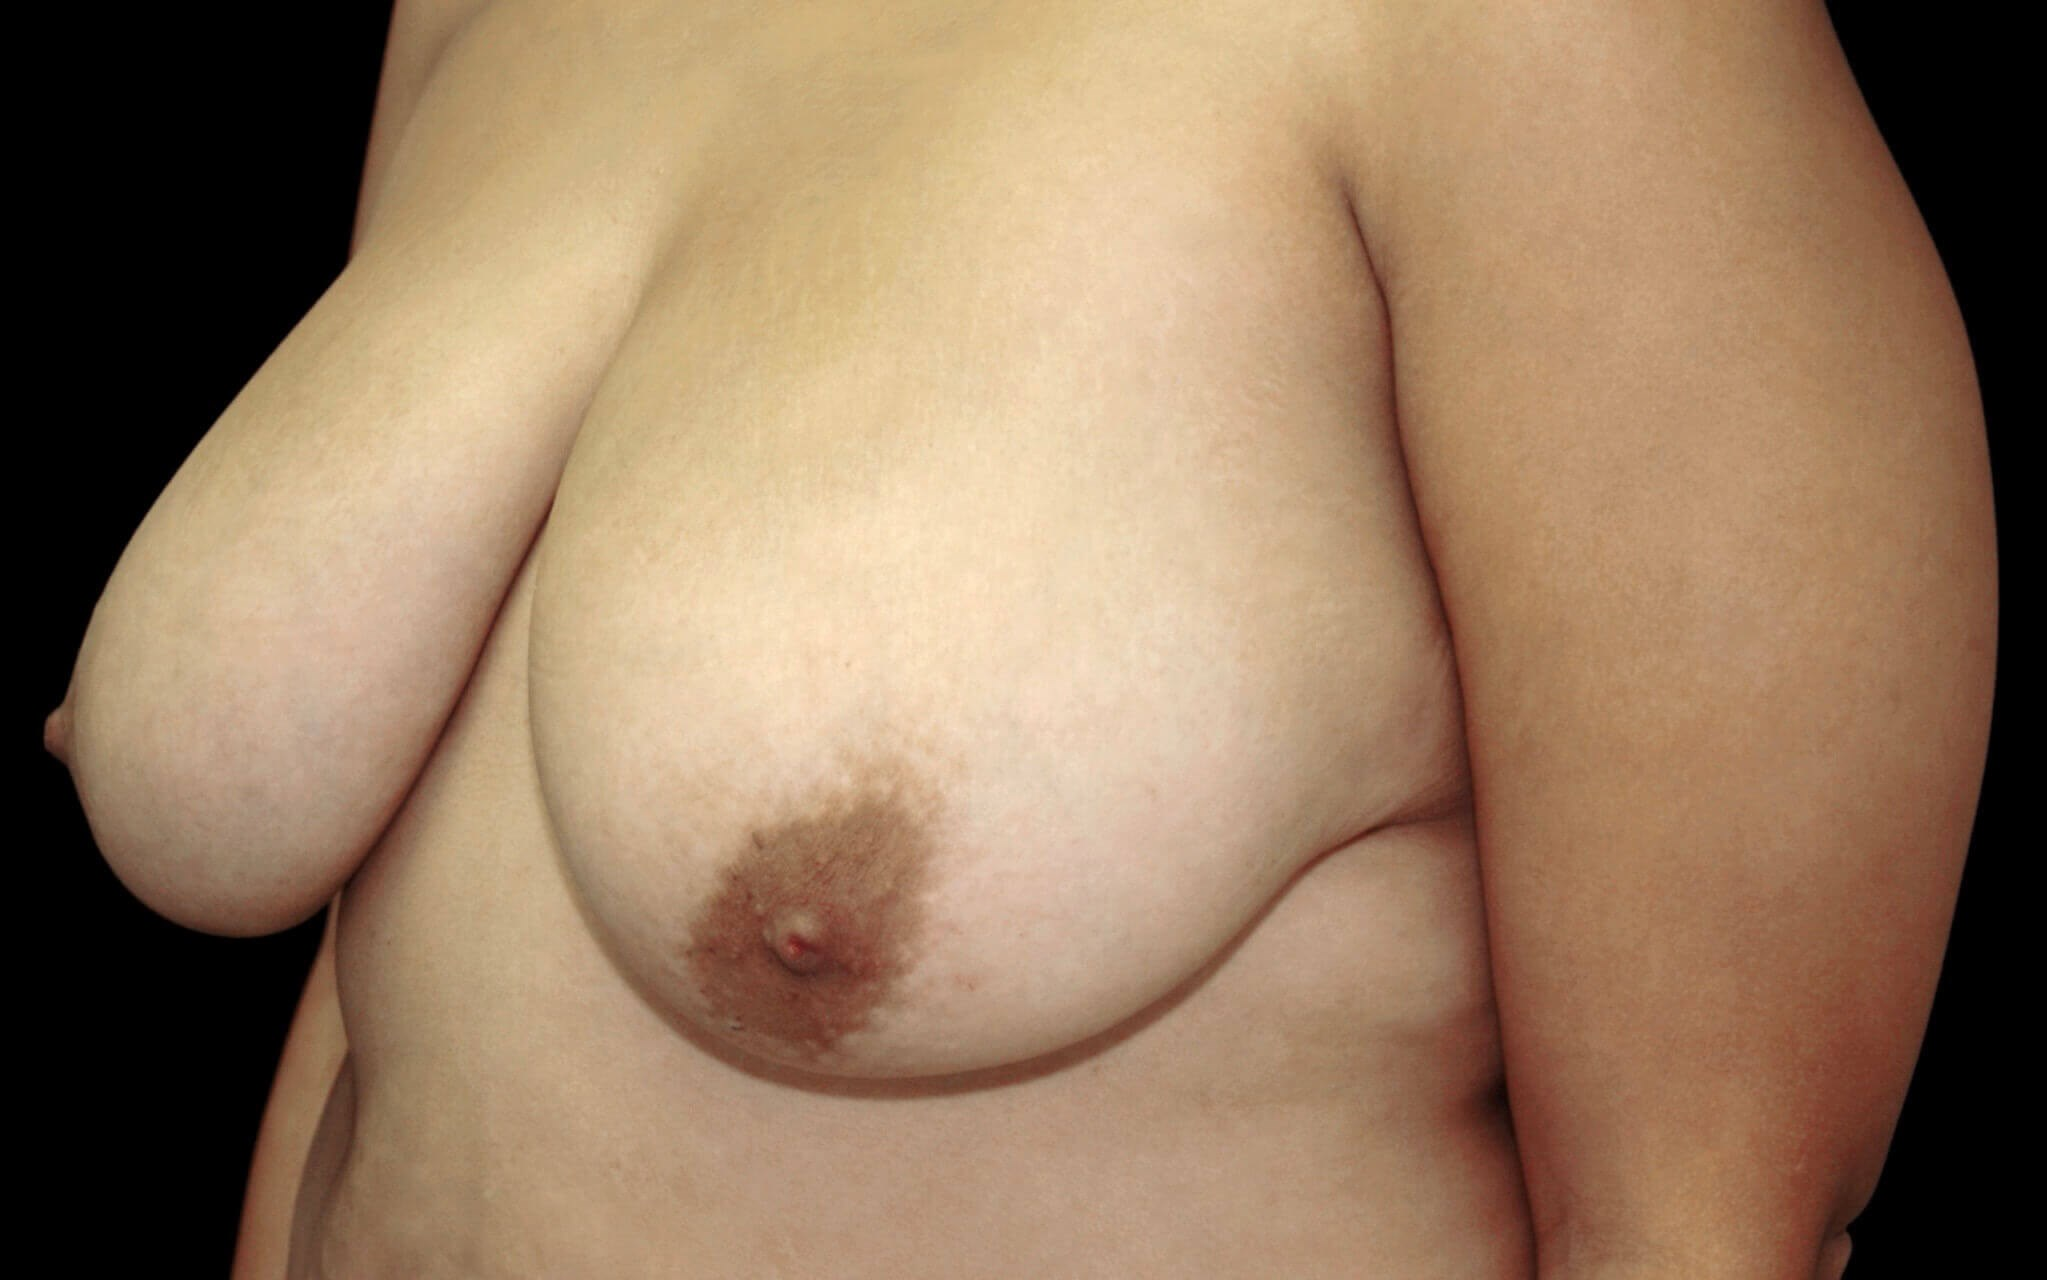 DALLAS WOMAN HAS BREAST LIFT SURGERY